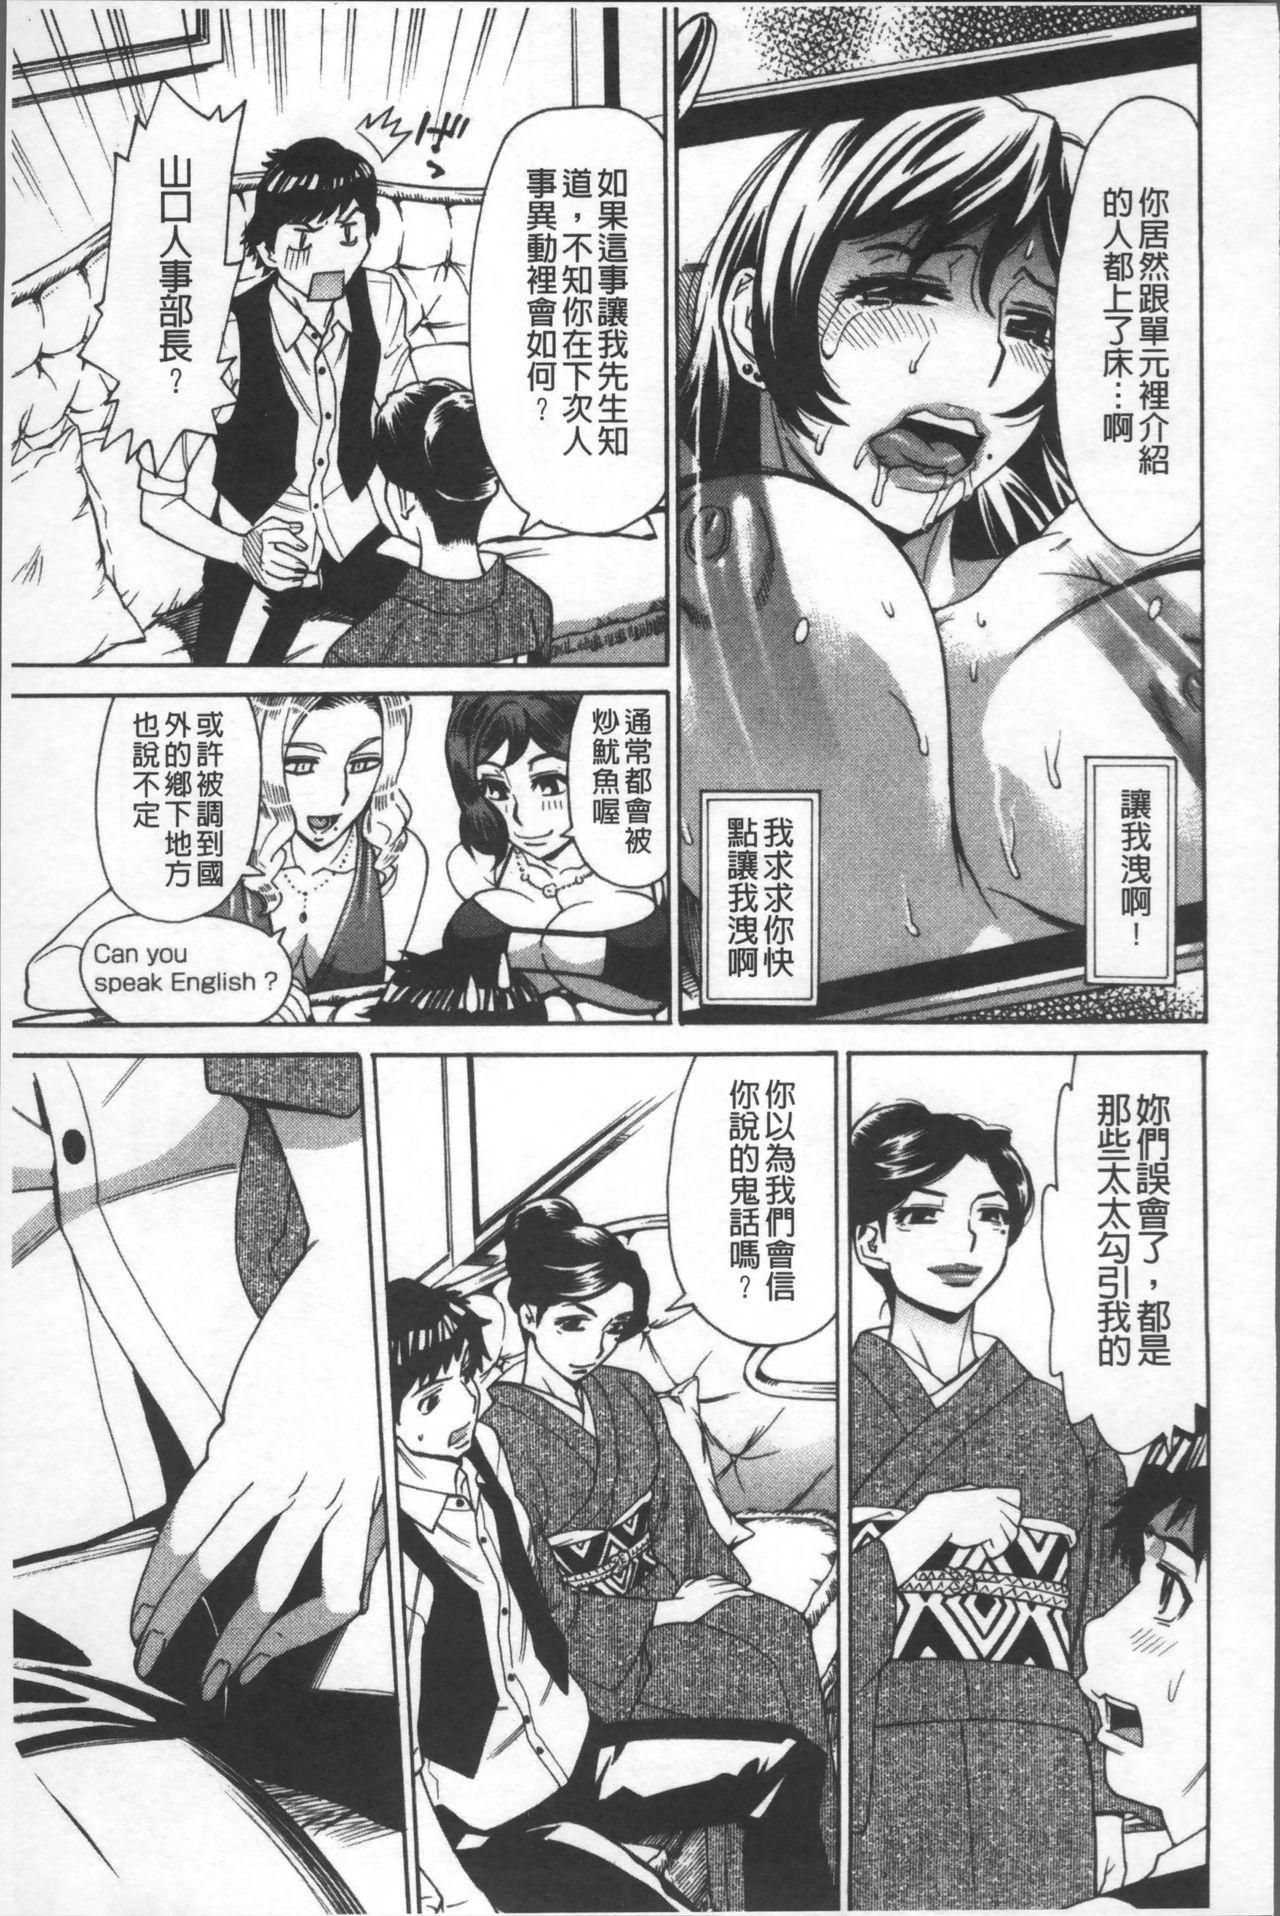 Hitozuma Kanshasai - SUPER EROTIC WIFE'S FESTIVAL 48